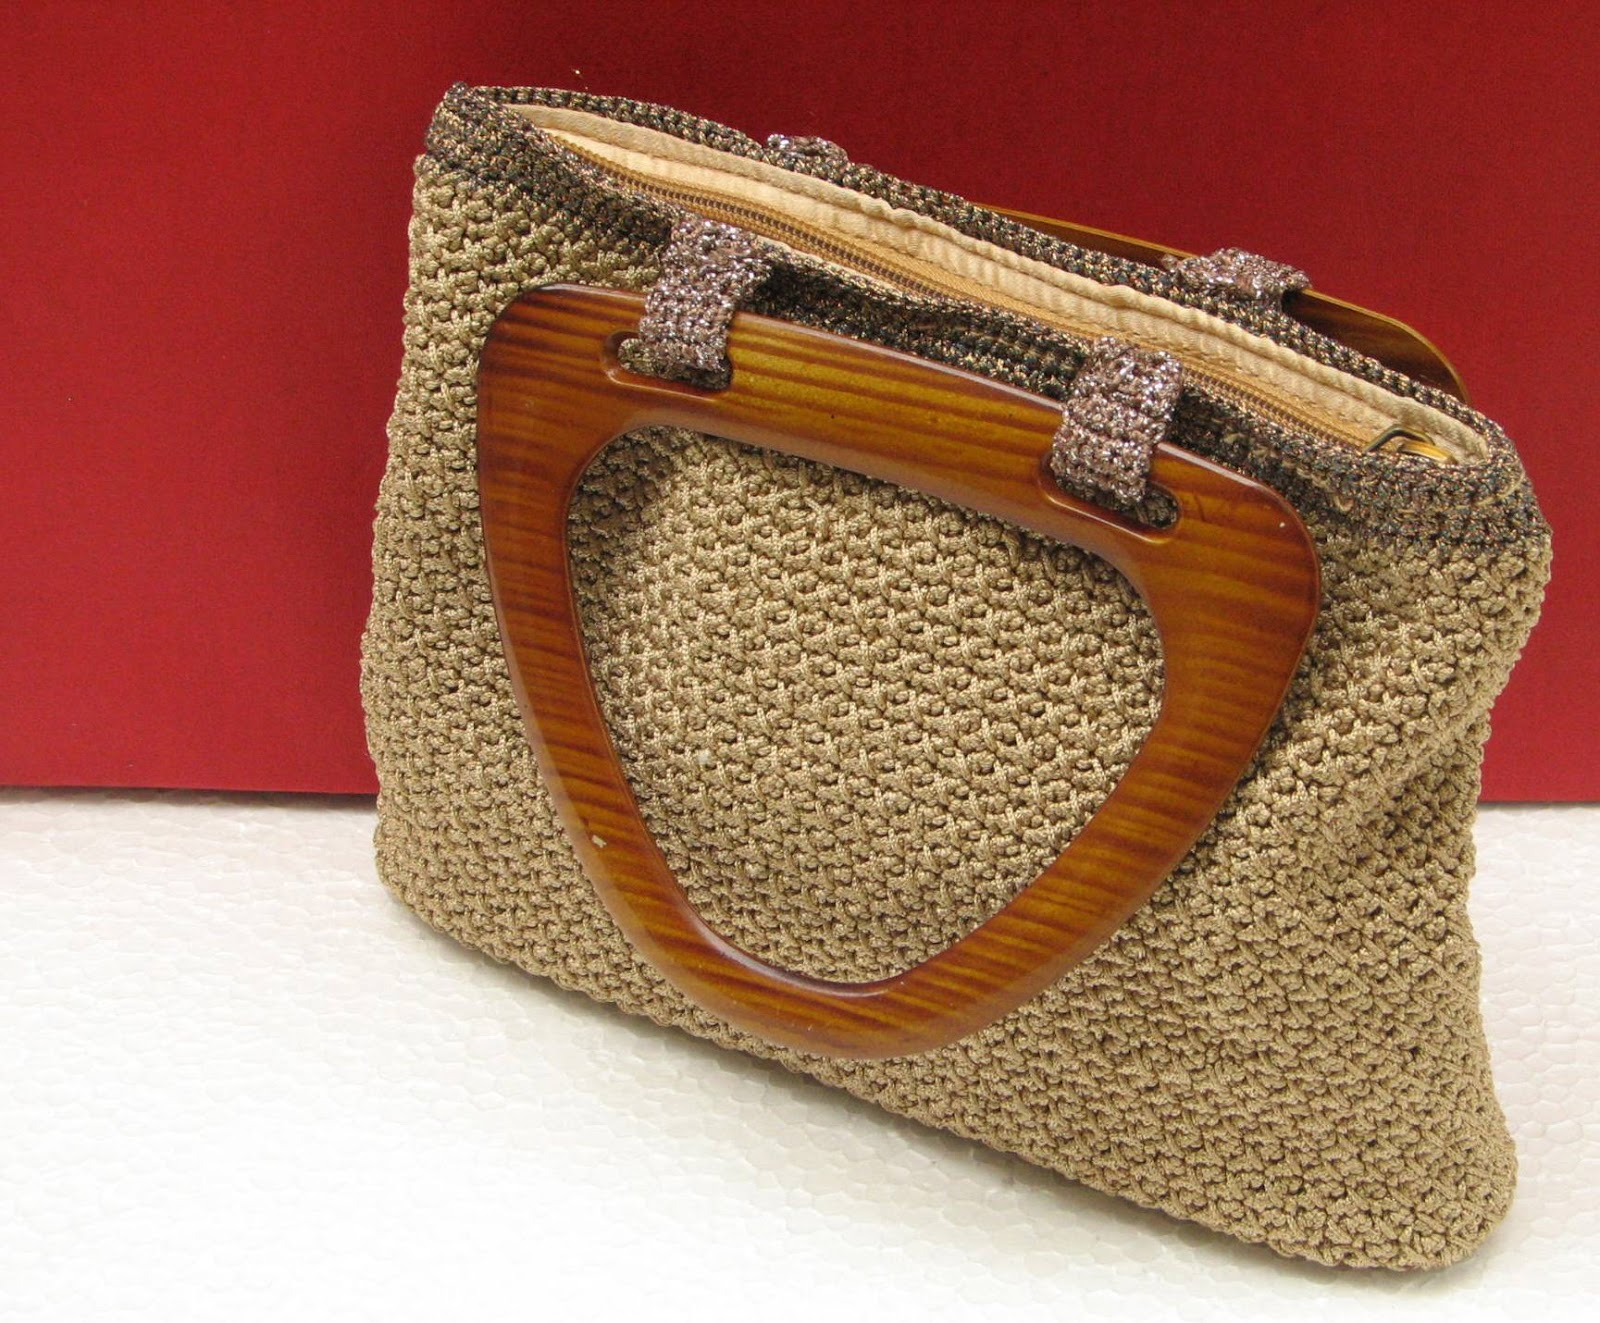 Handmade Crochet Bags : DISHA FOUNDATION : Handmade crochet bags